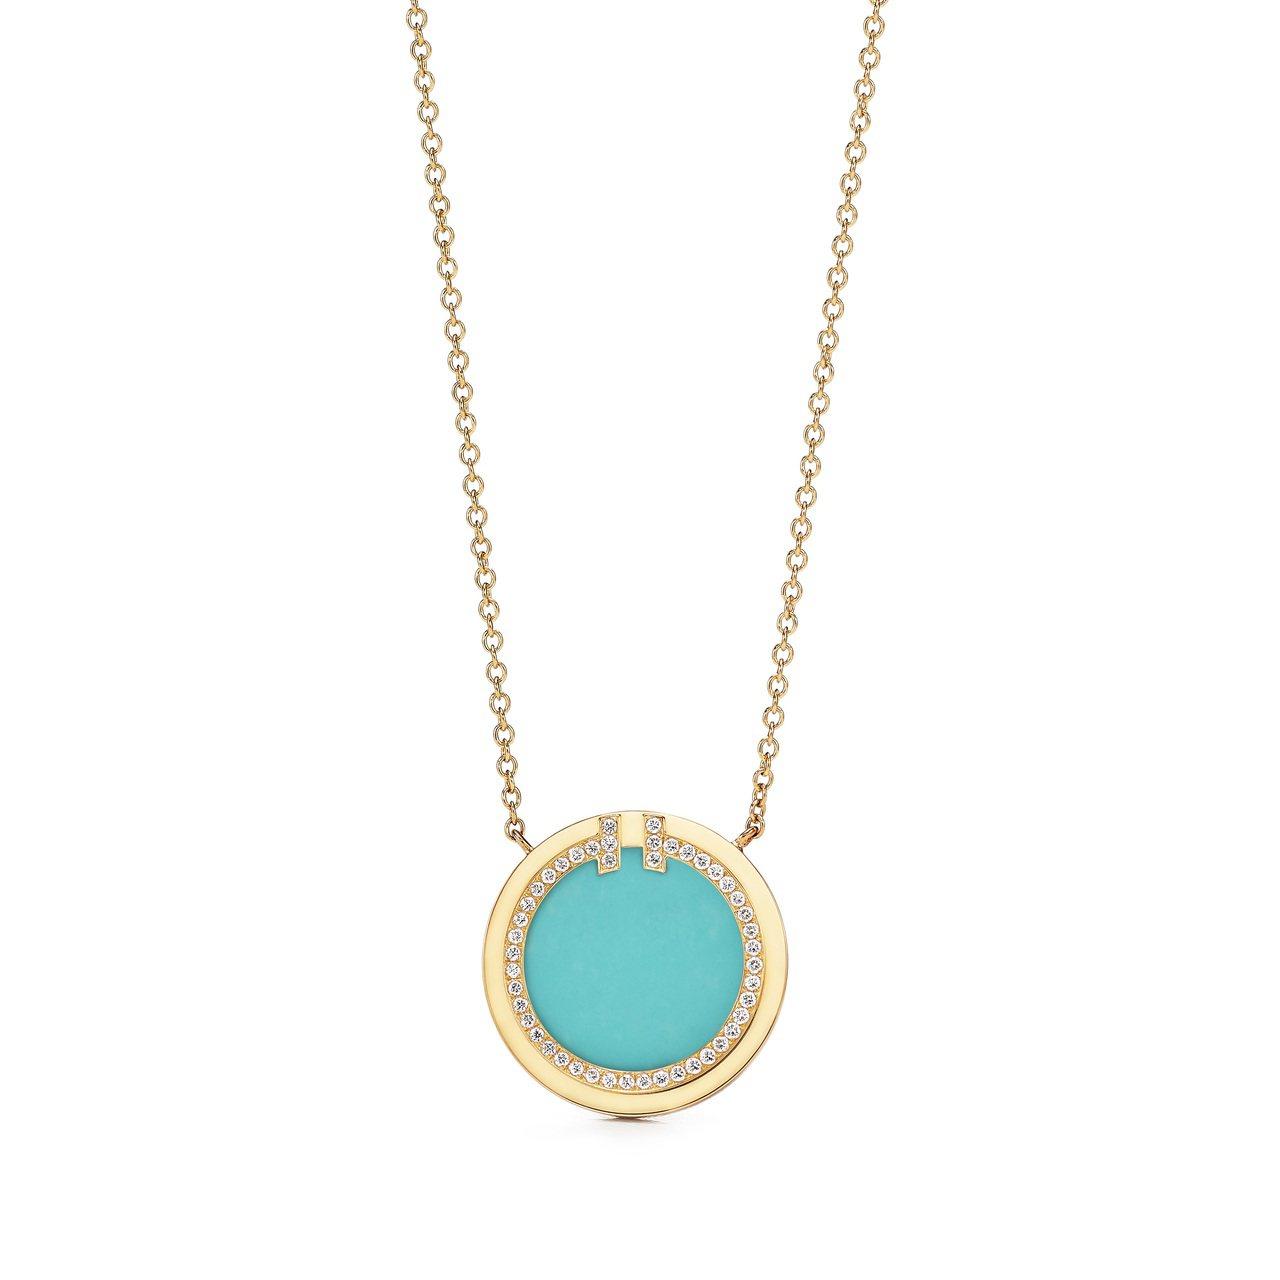 Tiffany T Two 18K金鑲嵌綠松石與鑽石鍊墜,約90,000元。圖/...